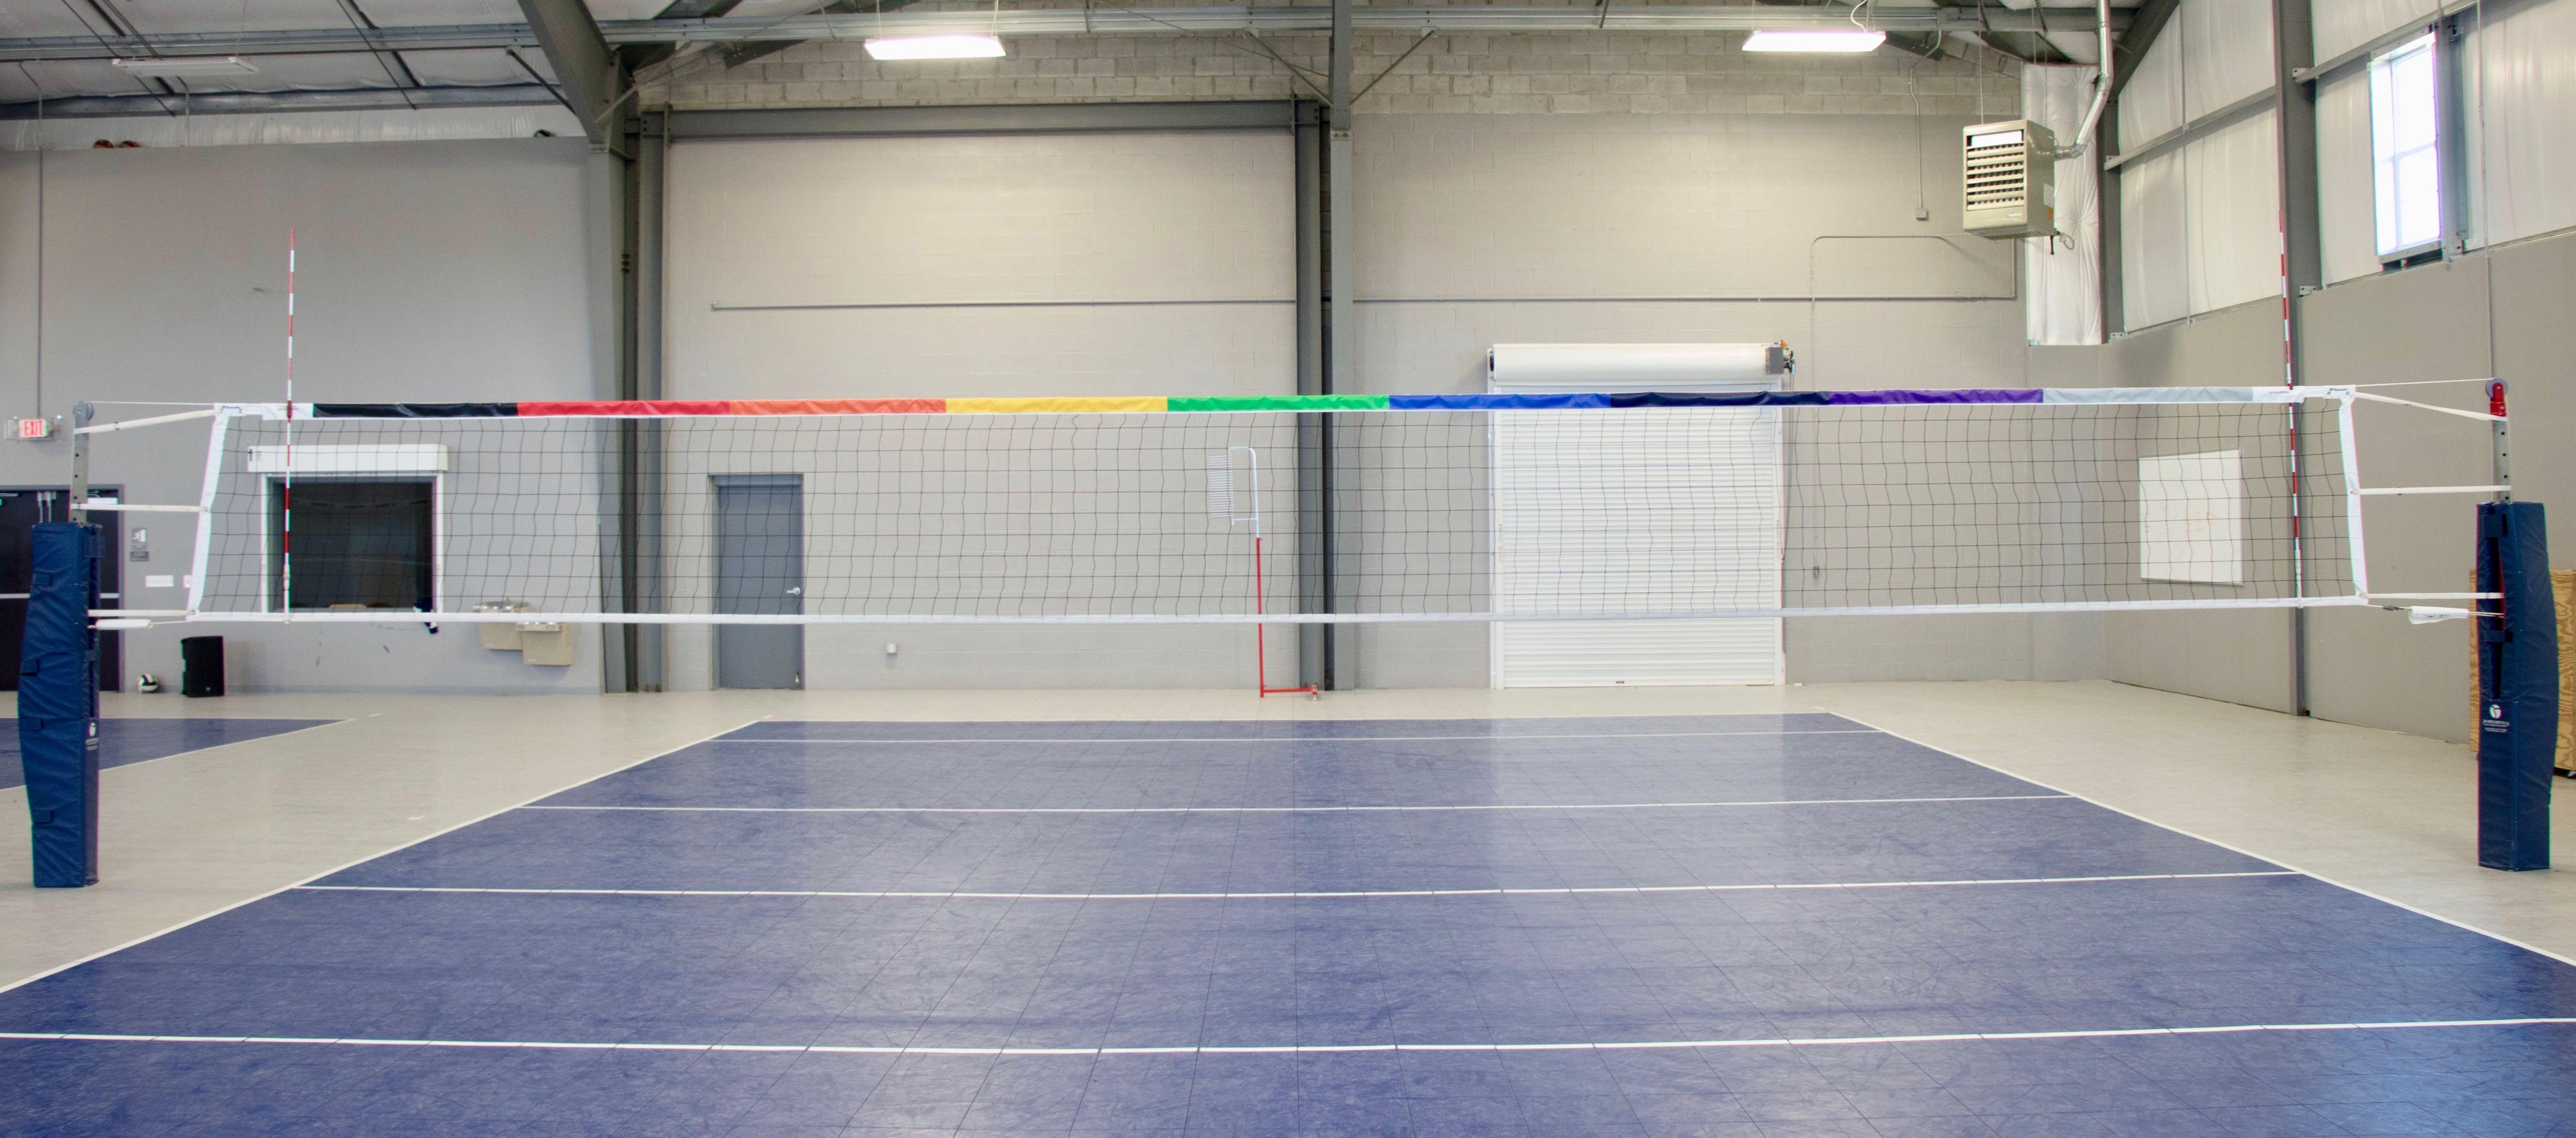 Standard Badminton Net Indoor Outdoor Sports Volleyball Training Ball Exercise